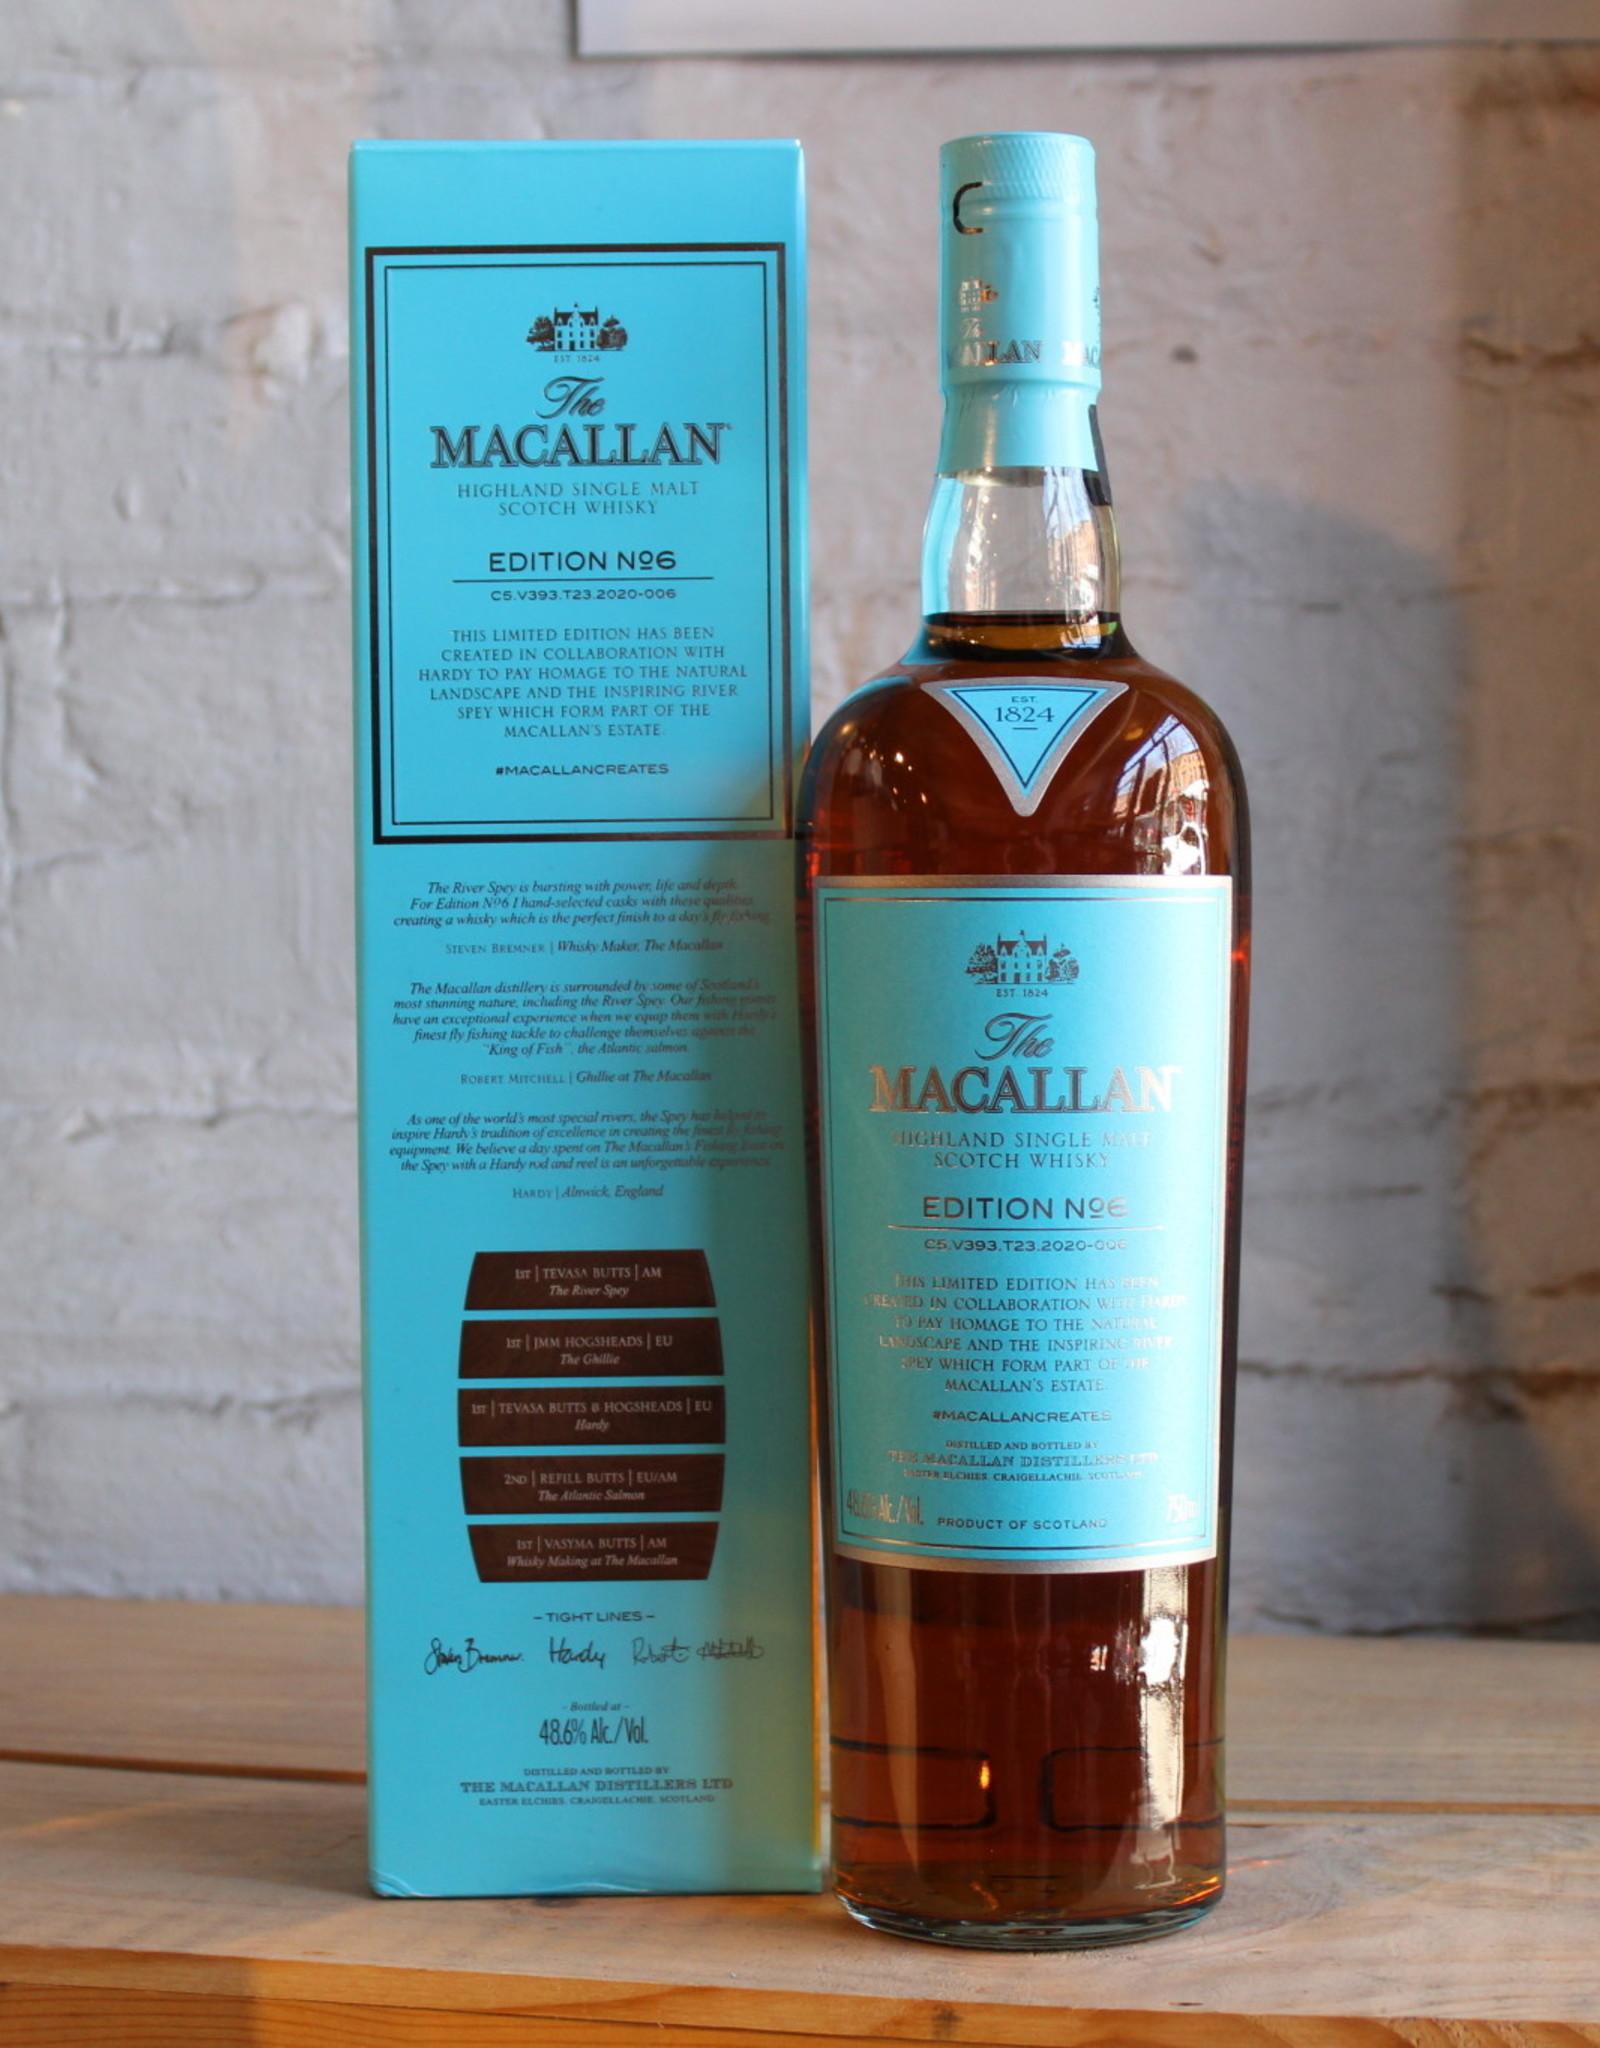 The Macallan Scotch Single Malt Edition No. 6 Scotch Whisky - Speyside, Highland, Scotland (750ml)